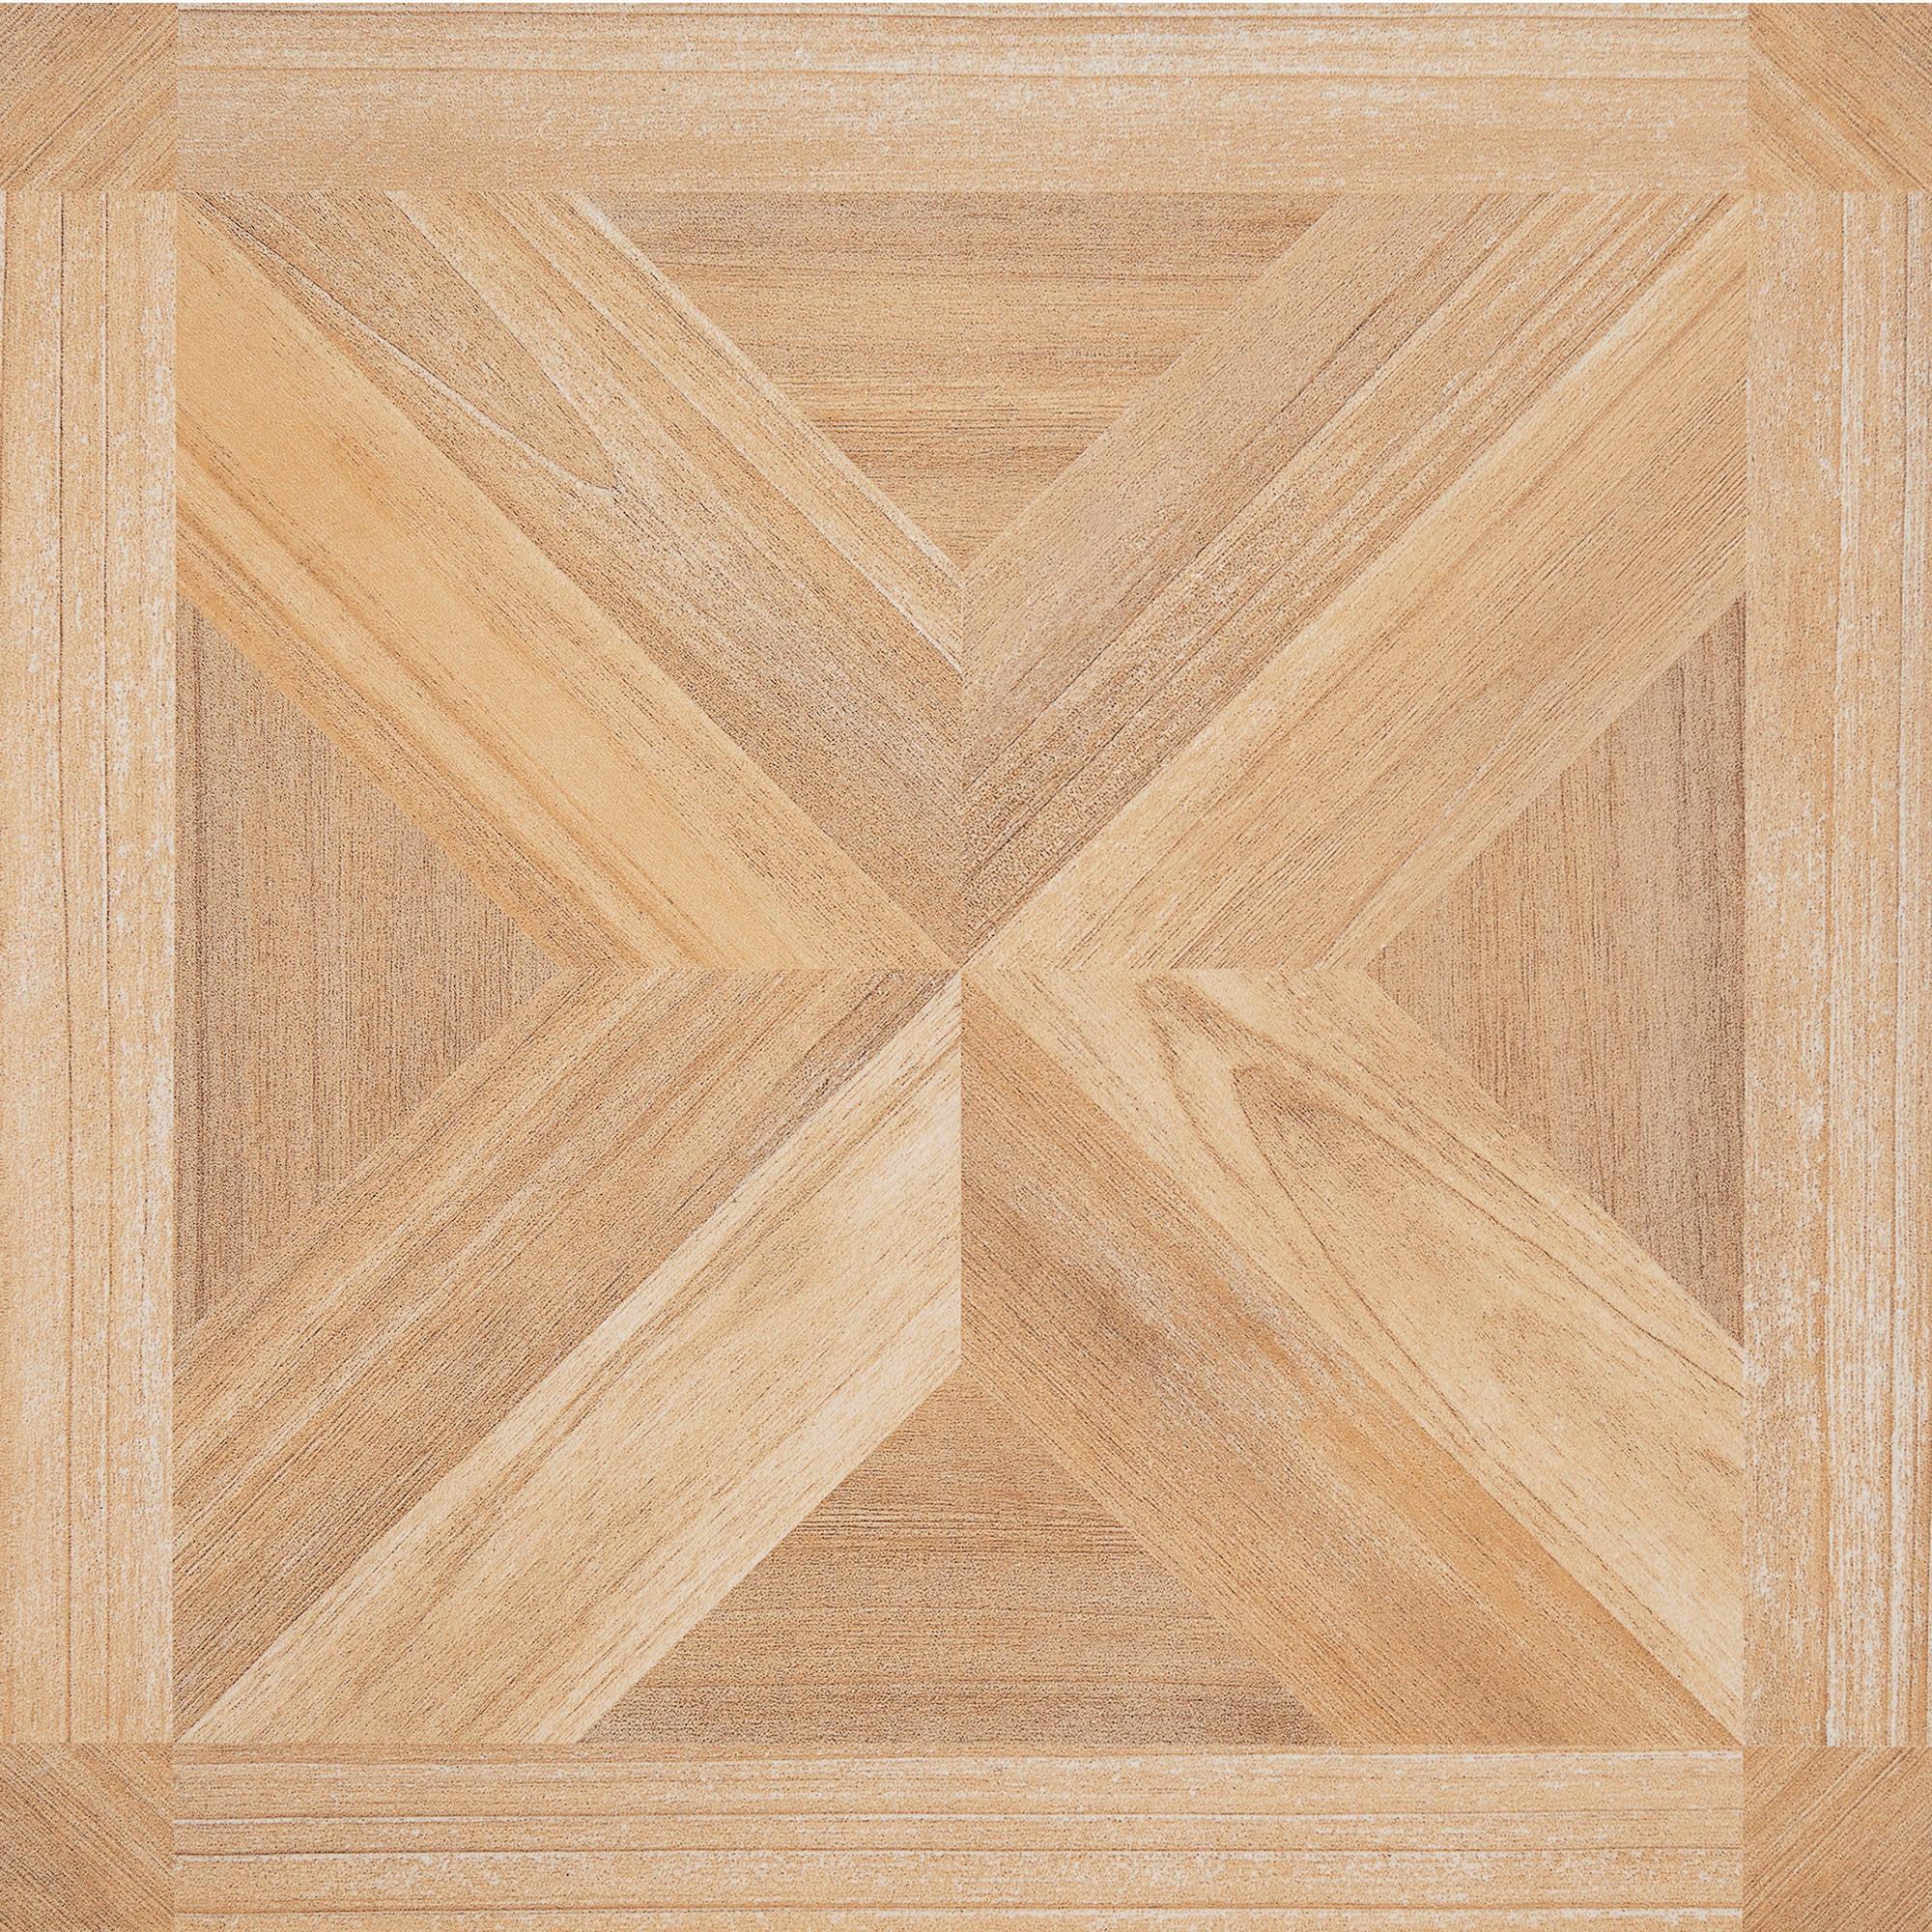 Nexus maple x parquet 12x12 self adhesive vinyl floor tile 20 nexus maple x parquet 12x12 self adhesive vinyl floor tile 20 tiles20 sqft walmart dailygadgetfo Image collections